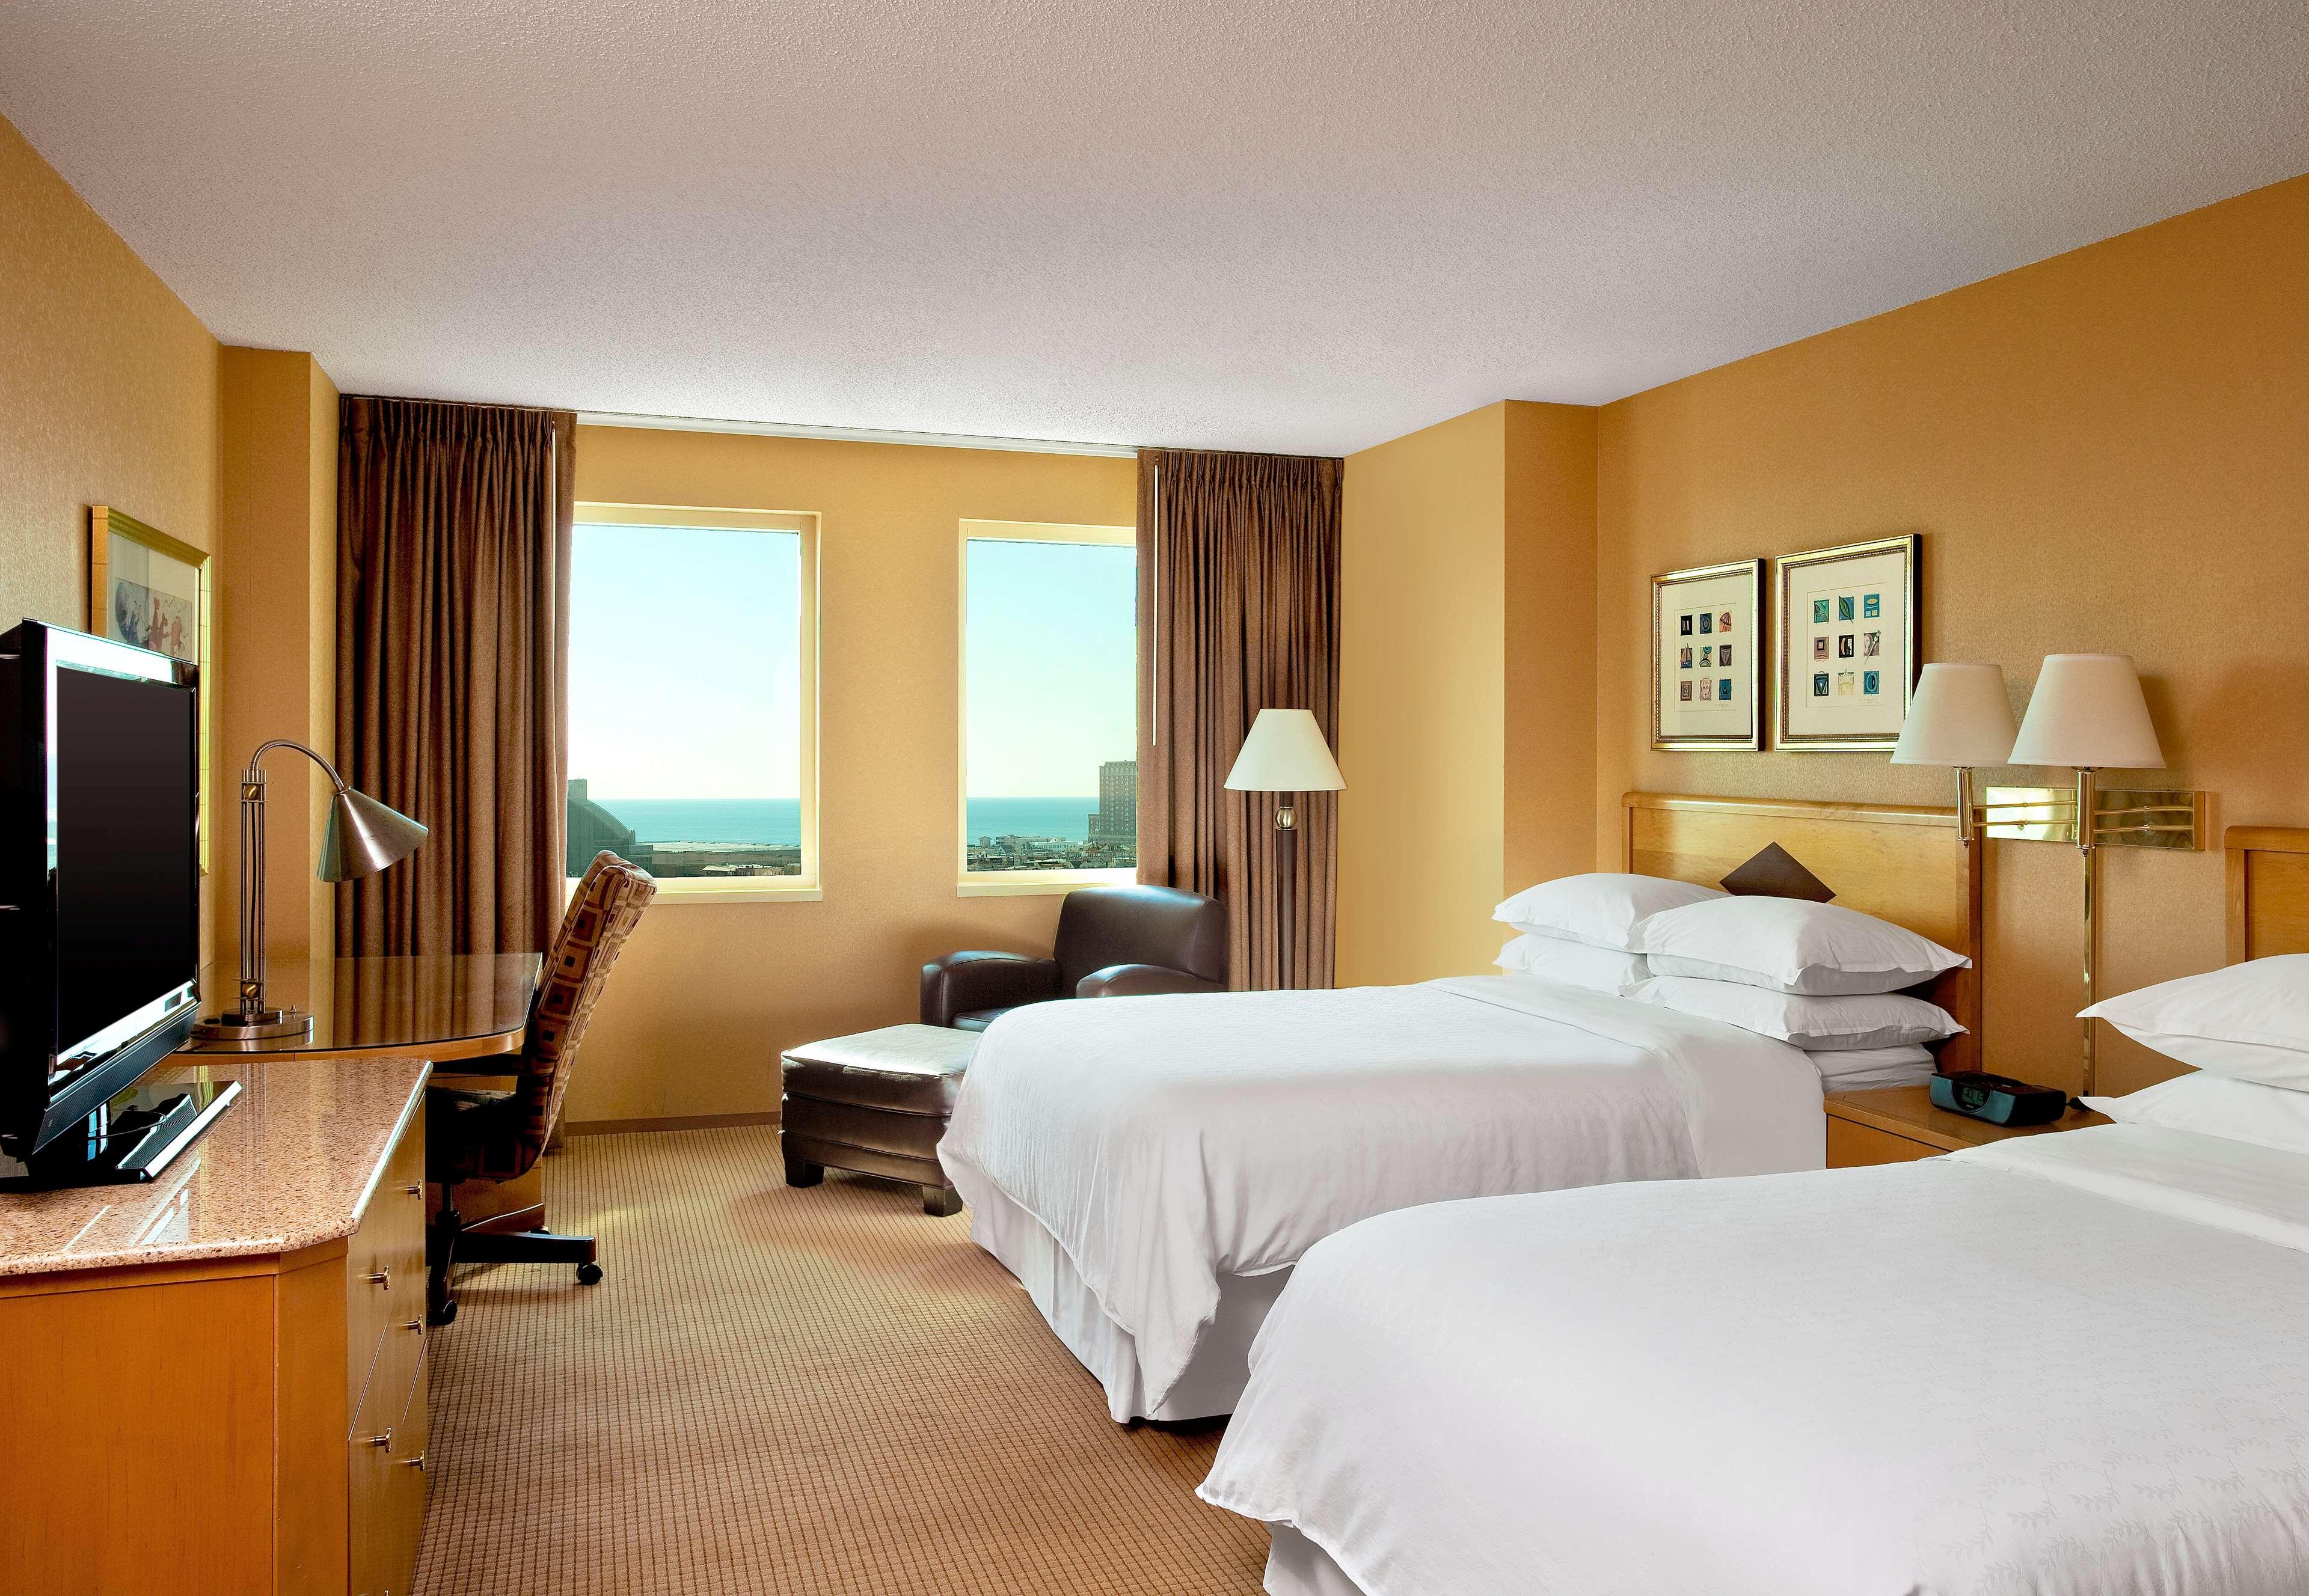 Sheraton Atlantic City Convention Center Hotel image 7